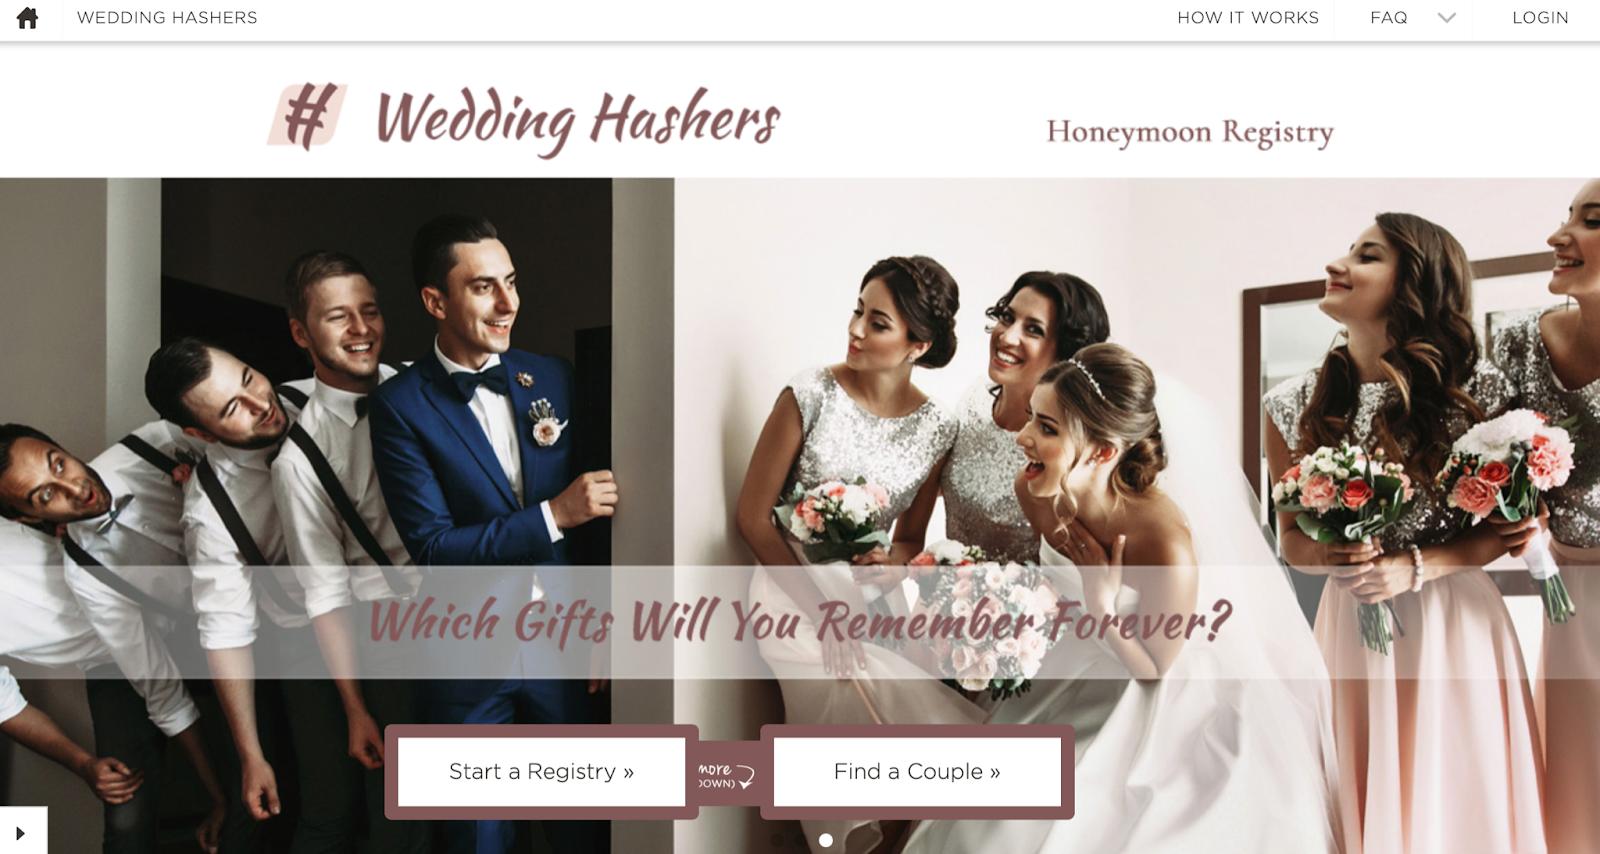 wedding hashers honeymoon registry